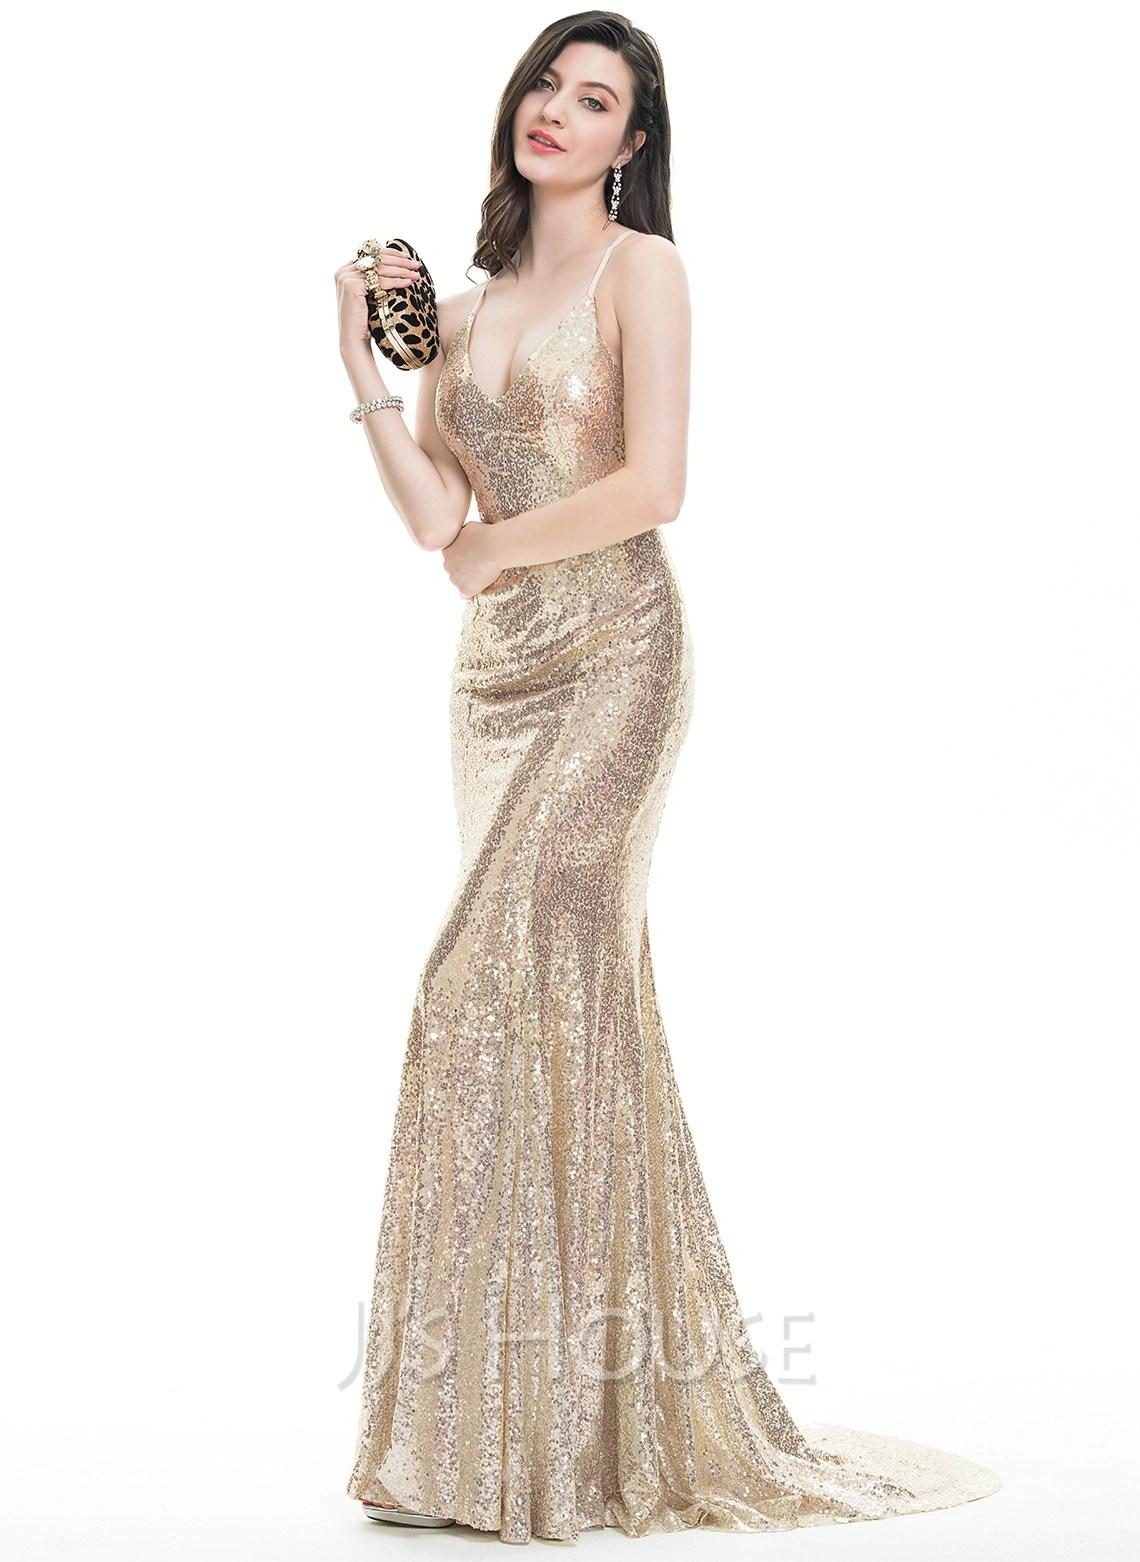 TrumpetMermaid Vneck Sweep Train Sequined Prom Dresses